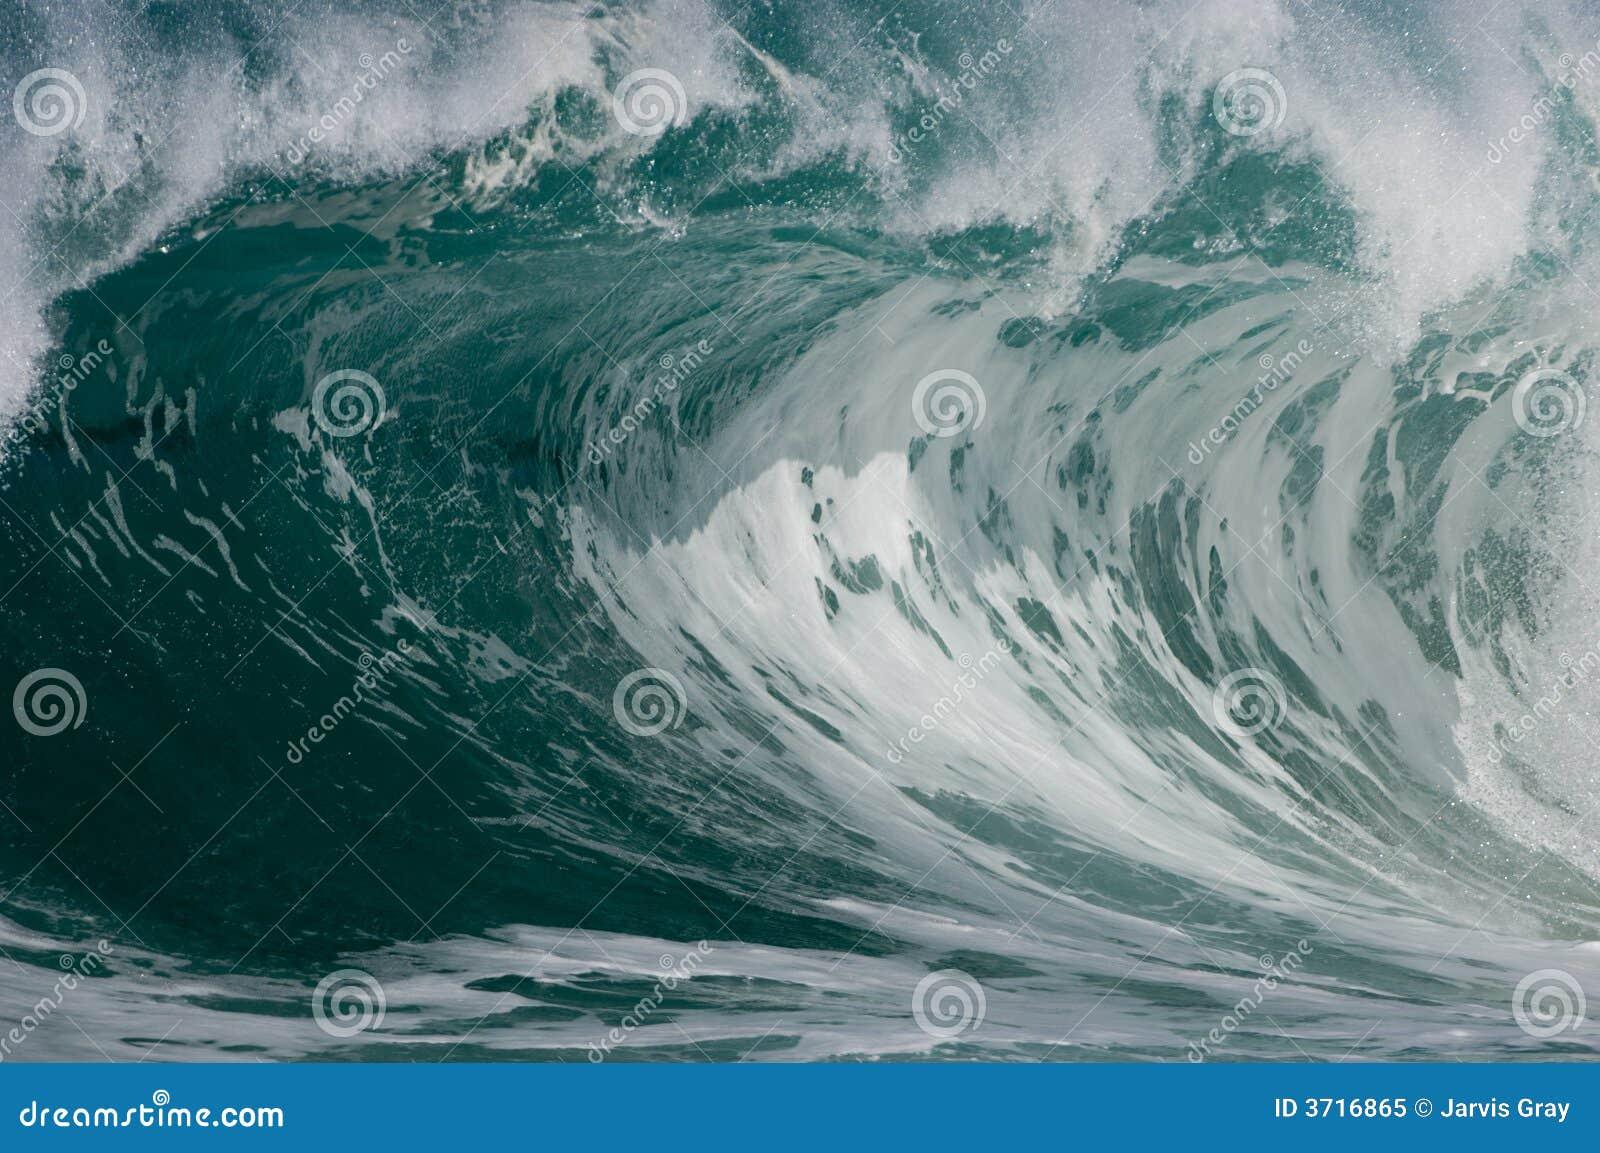 Breaking surf wave